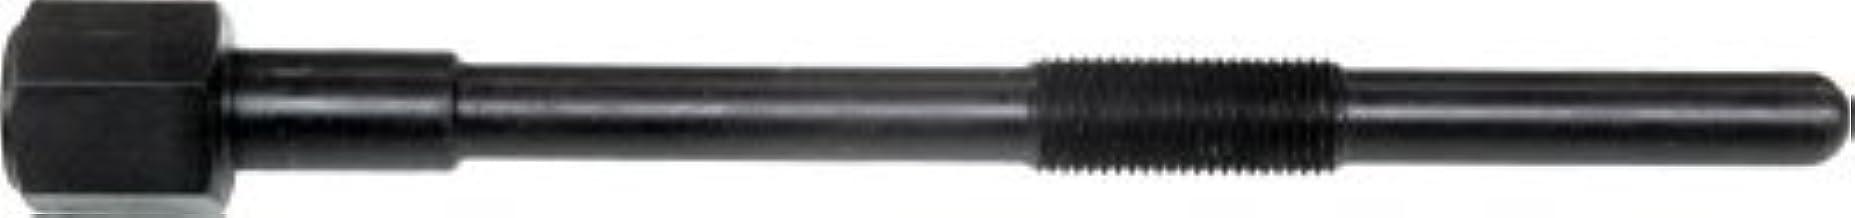 ECONOMY PRIMARY CLUTCH PULLER SKI DOO FREESTYLE 550F PARK 2007-2008